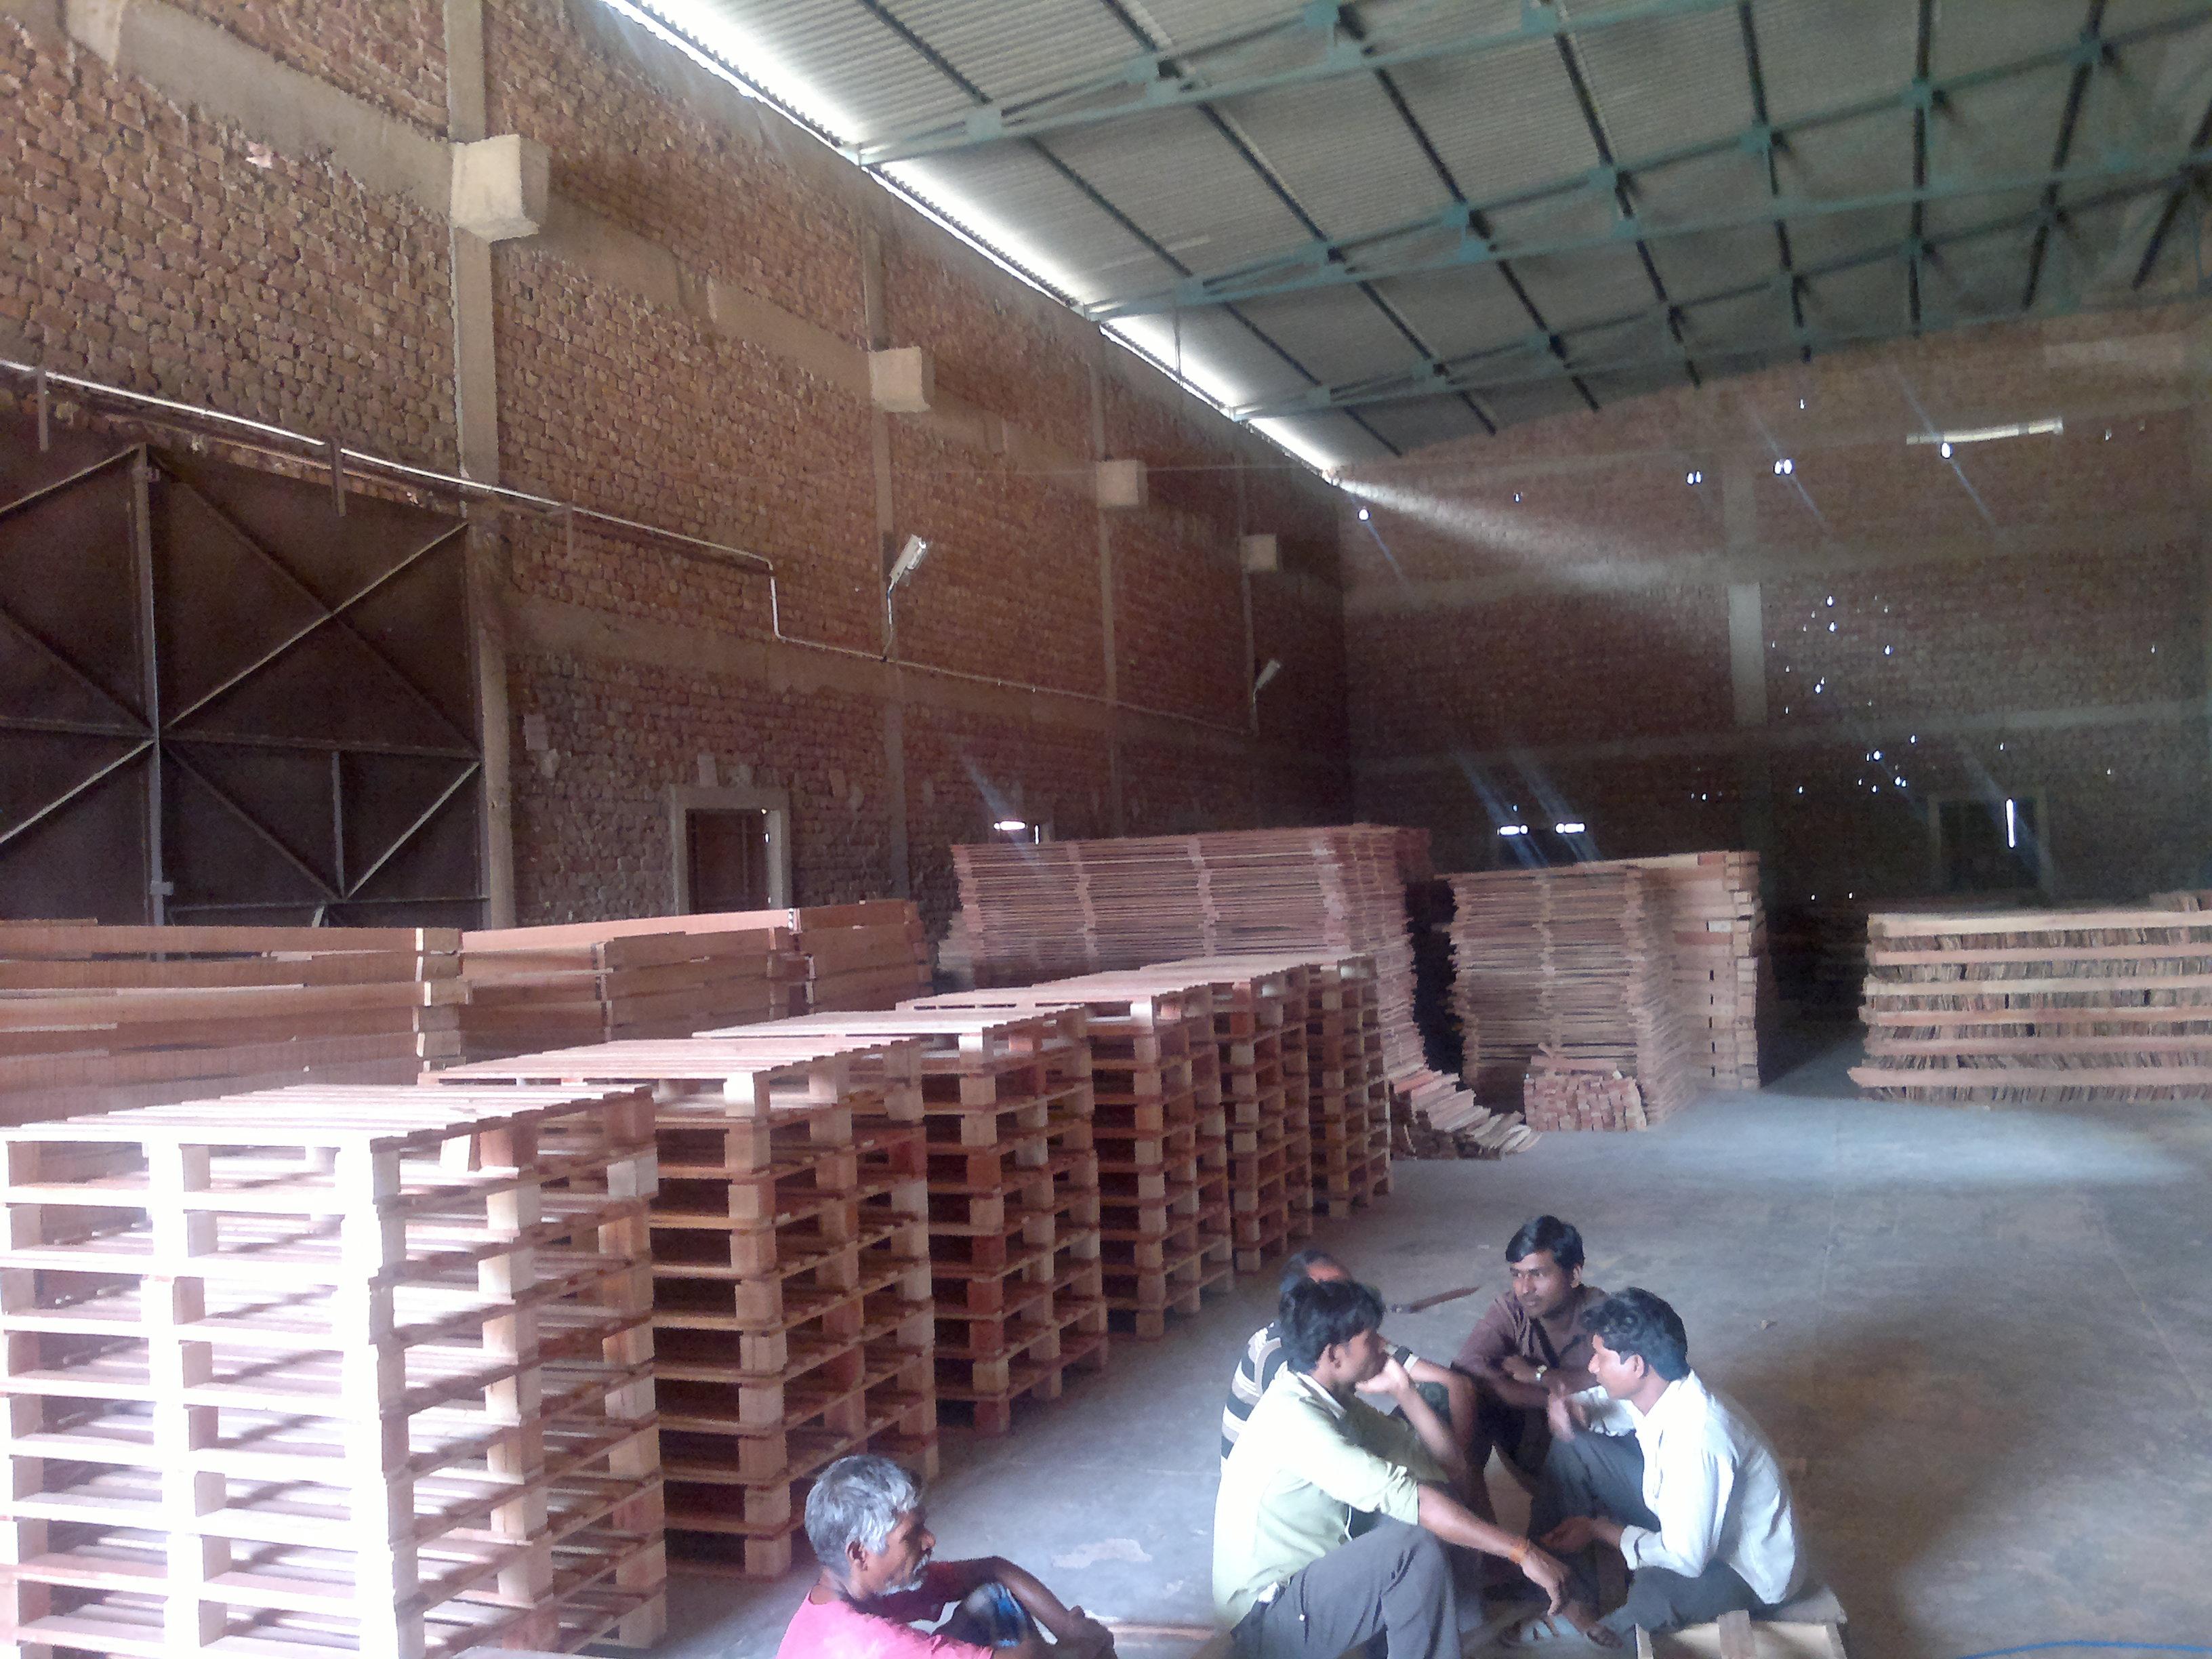 pallet manufacuturing facility in bhiwadi